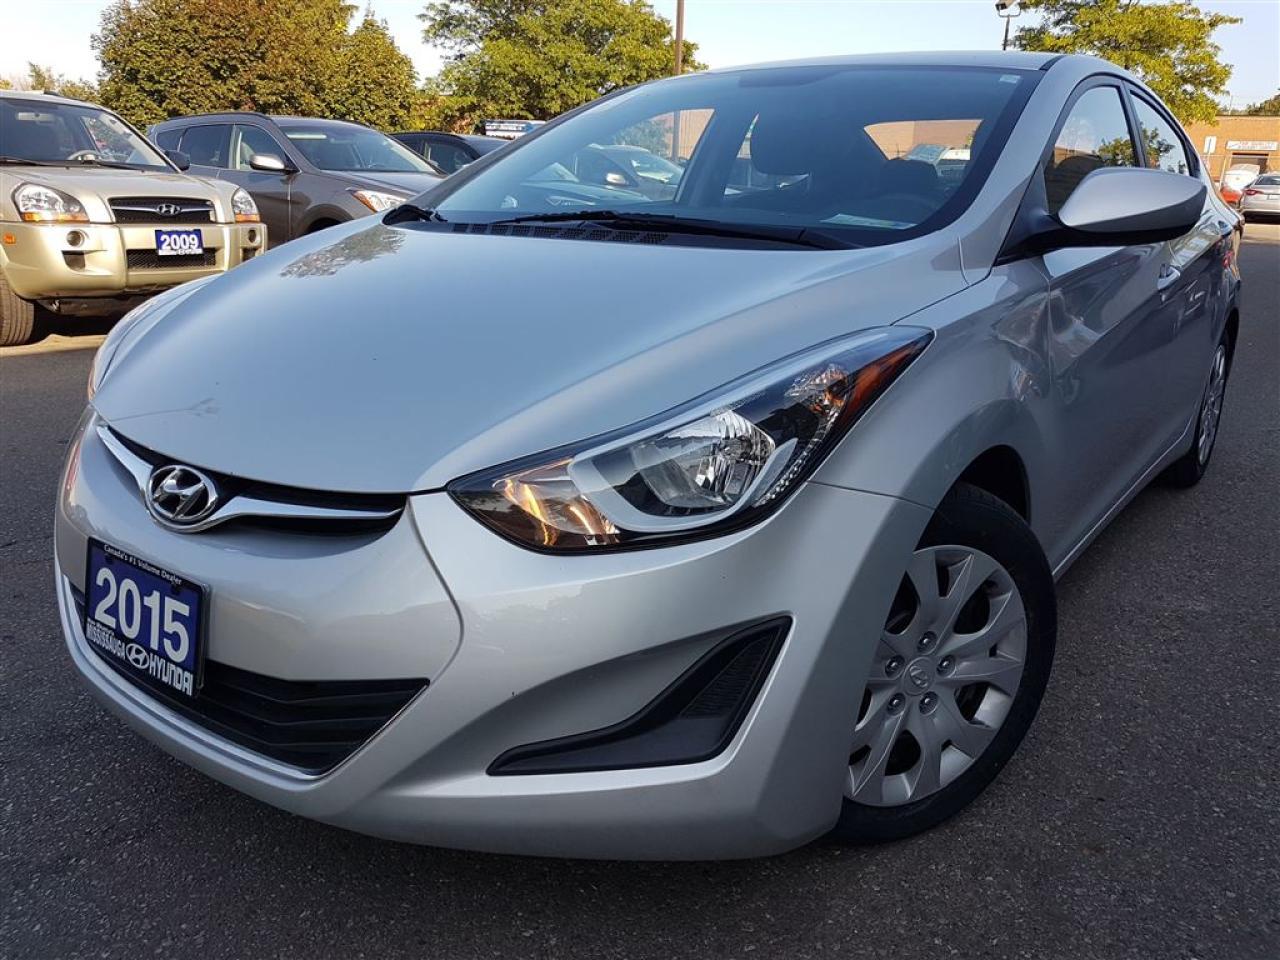 Photo of Silver 2015 Hyundai Elantra